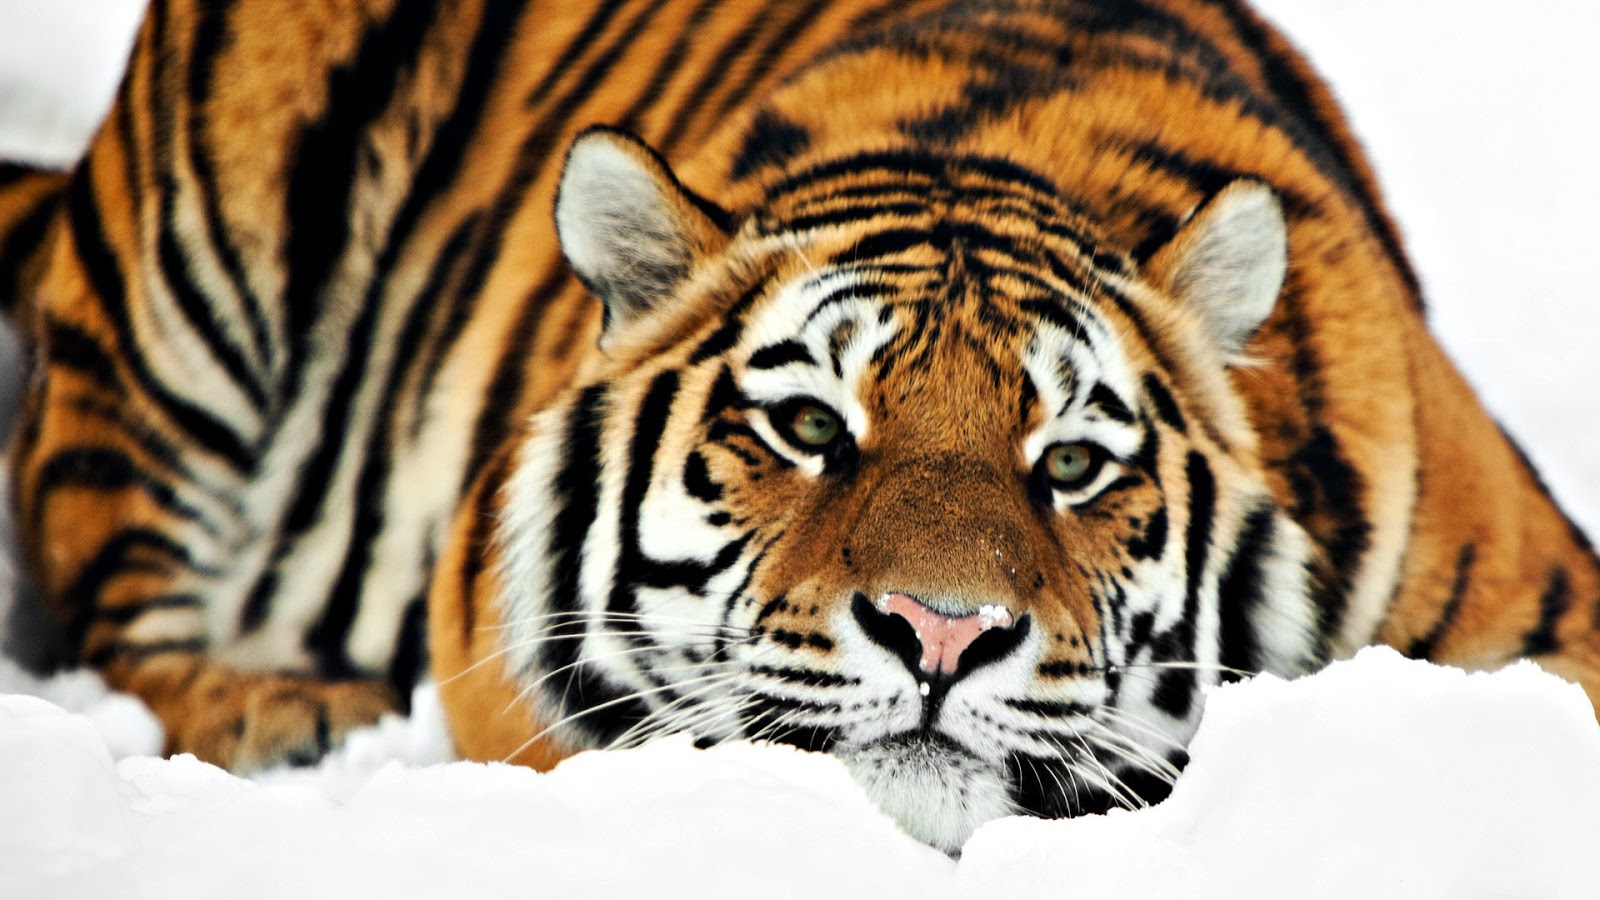 sedih-harimau-serbia-sakit-gigi-dan-minta-pertolongan-warga